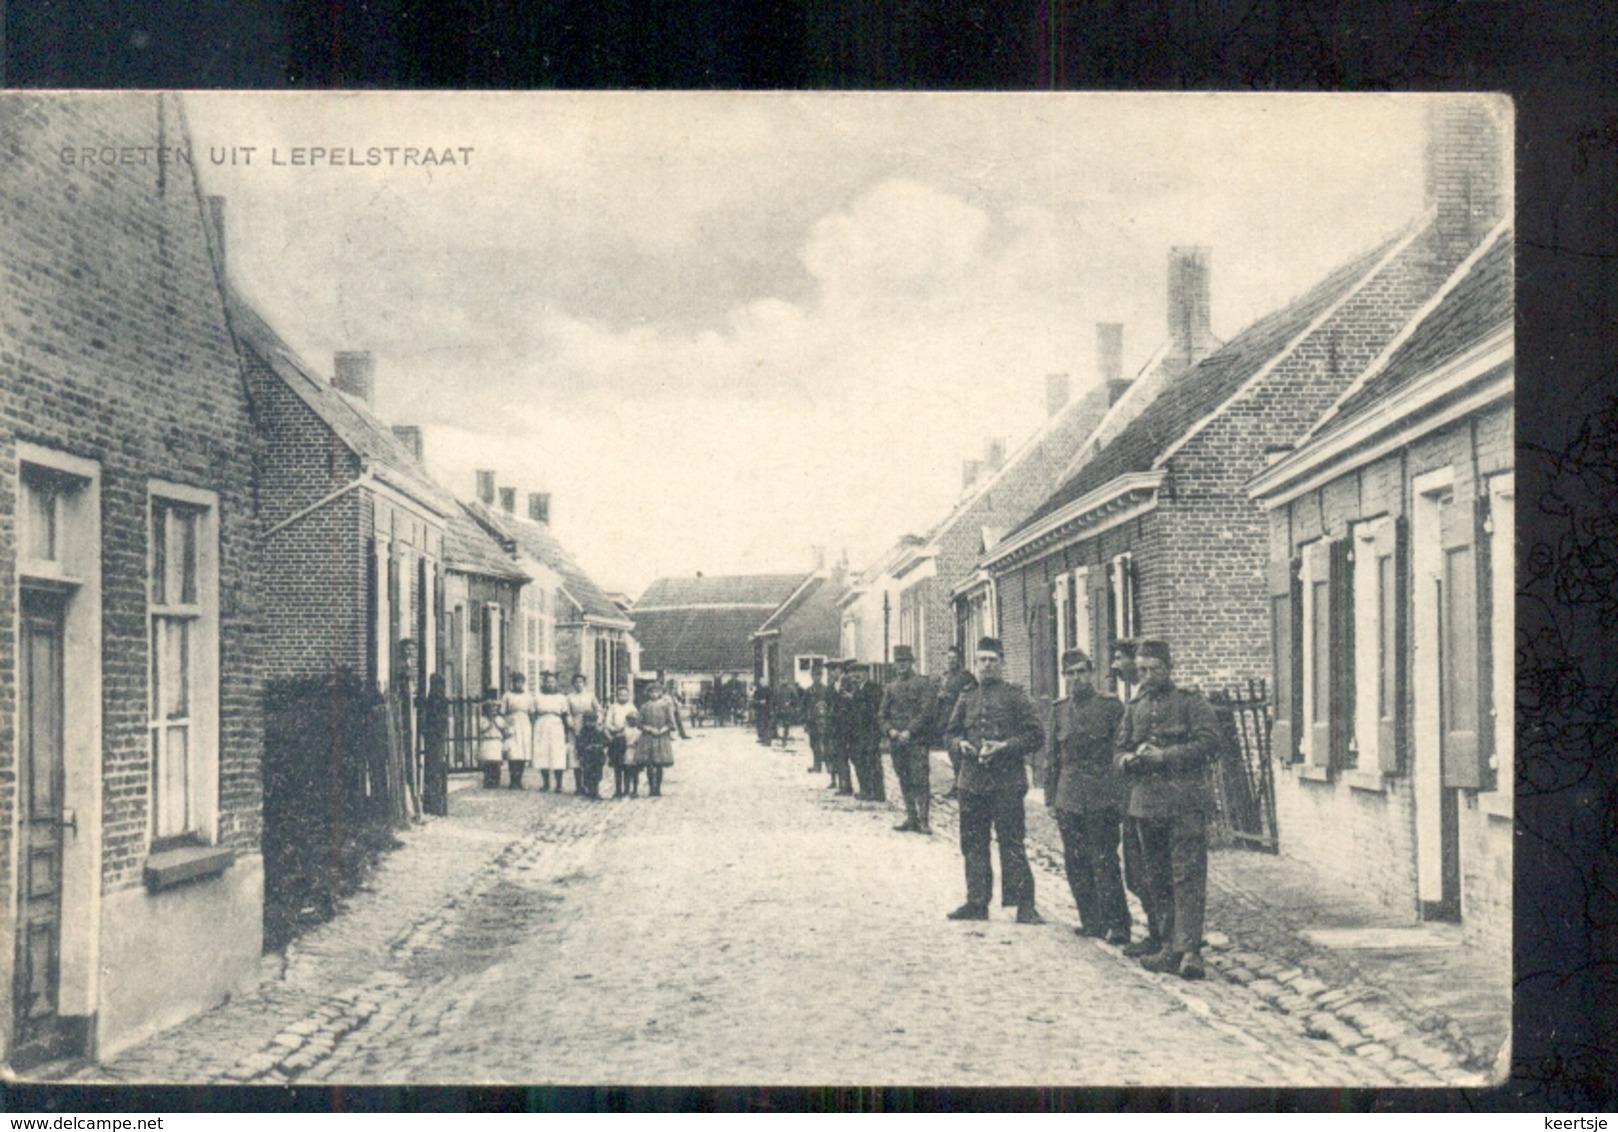 Lupelstraat - Groetn Uit - Soldaten - 1925 - Pays-Bas